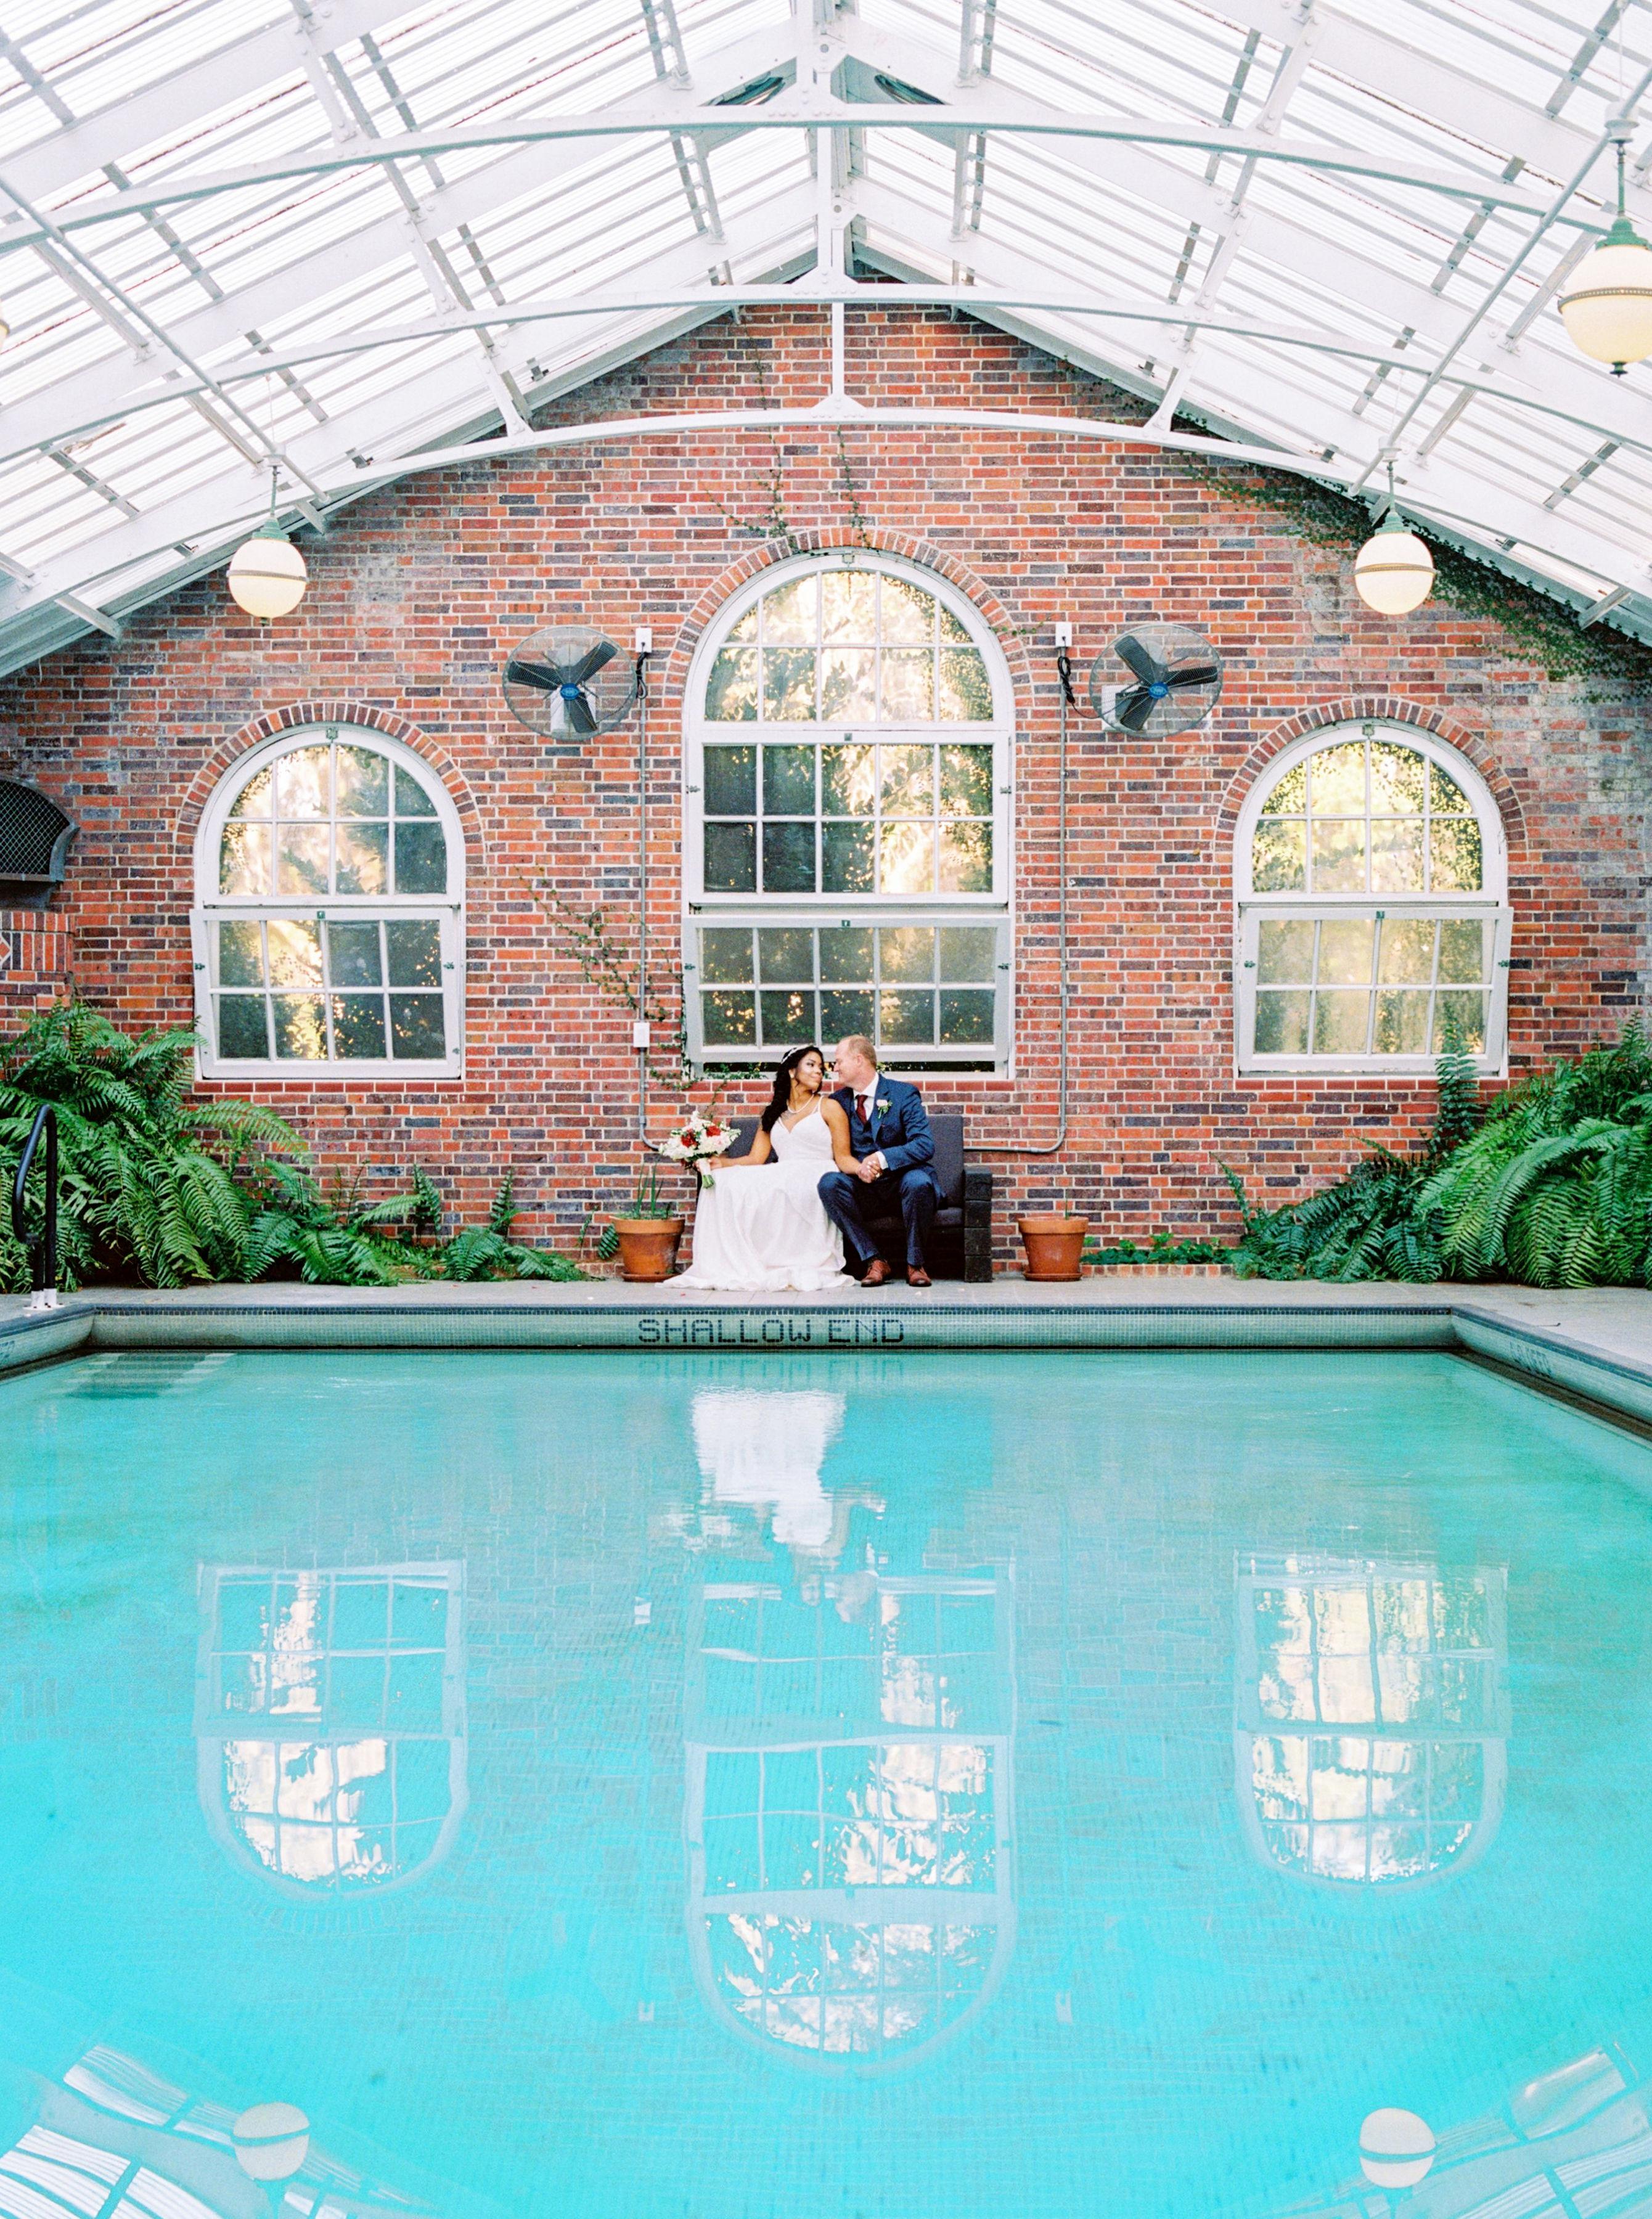 Pool House - Lisa Silva